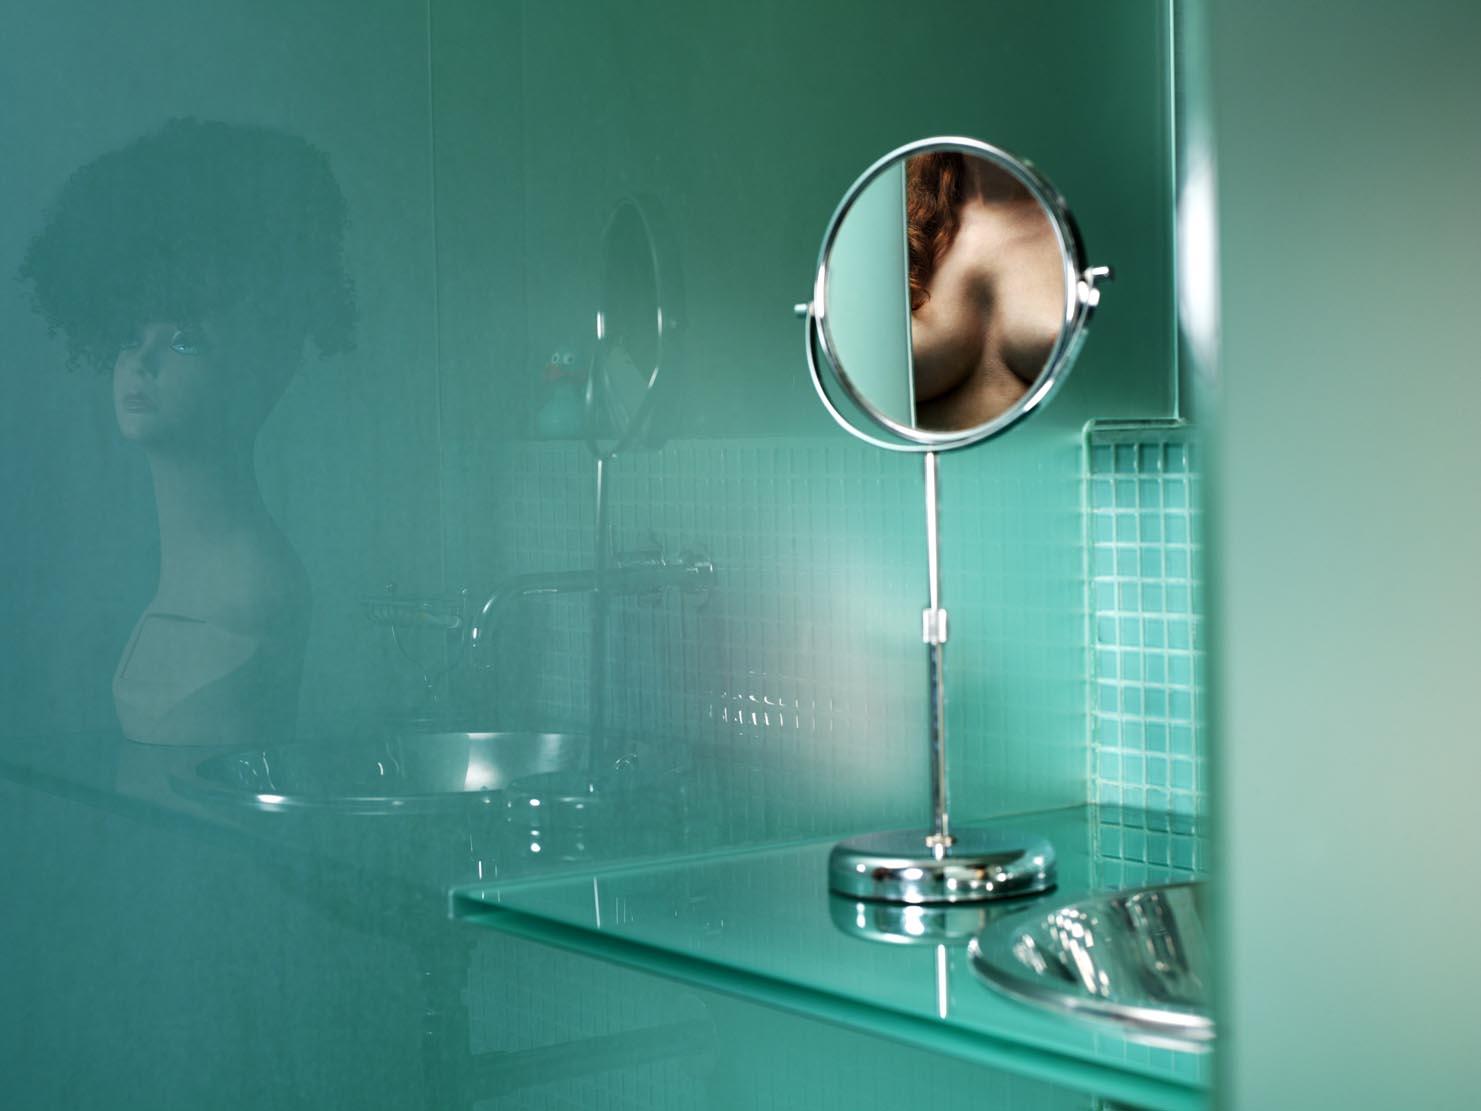 Interieur Woning Prinseneiland : Studio appartement prinseneiland jam spaces that matter